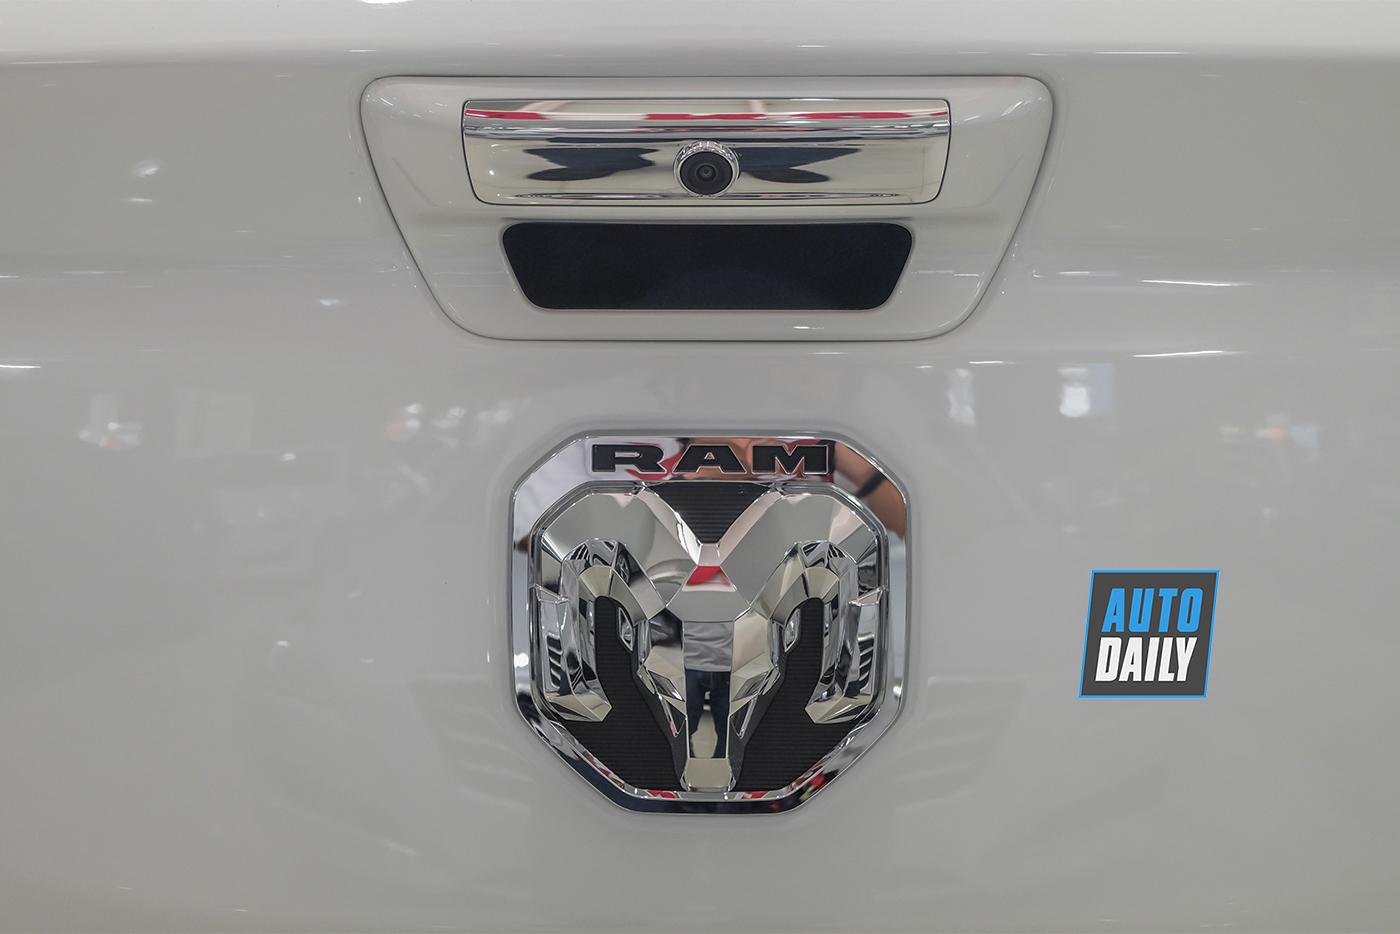 ram-1500-limited-2019-85.jpg